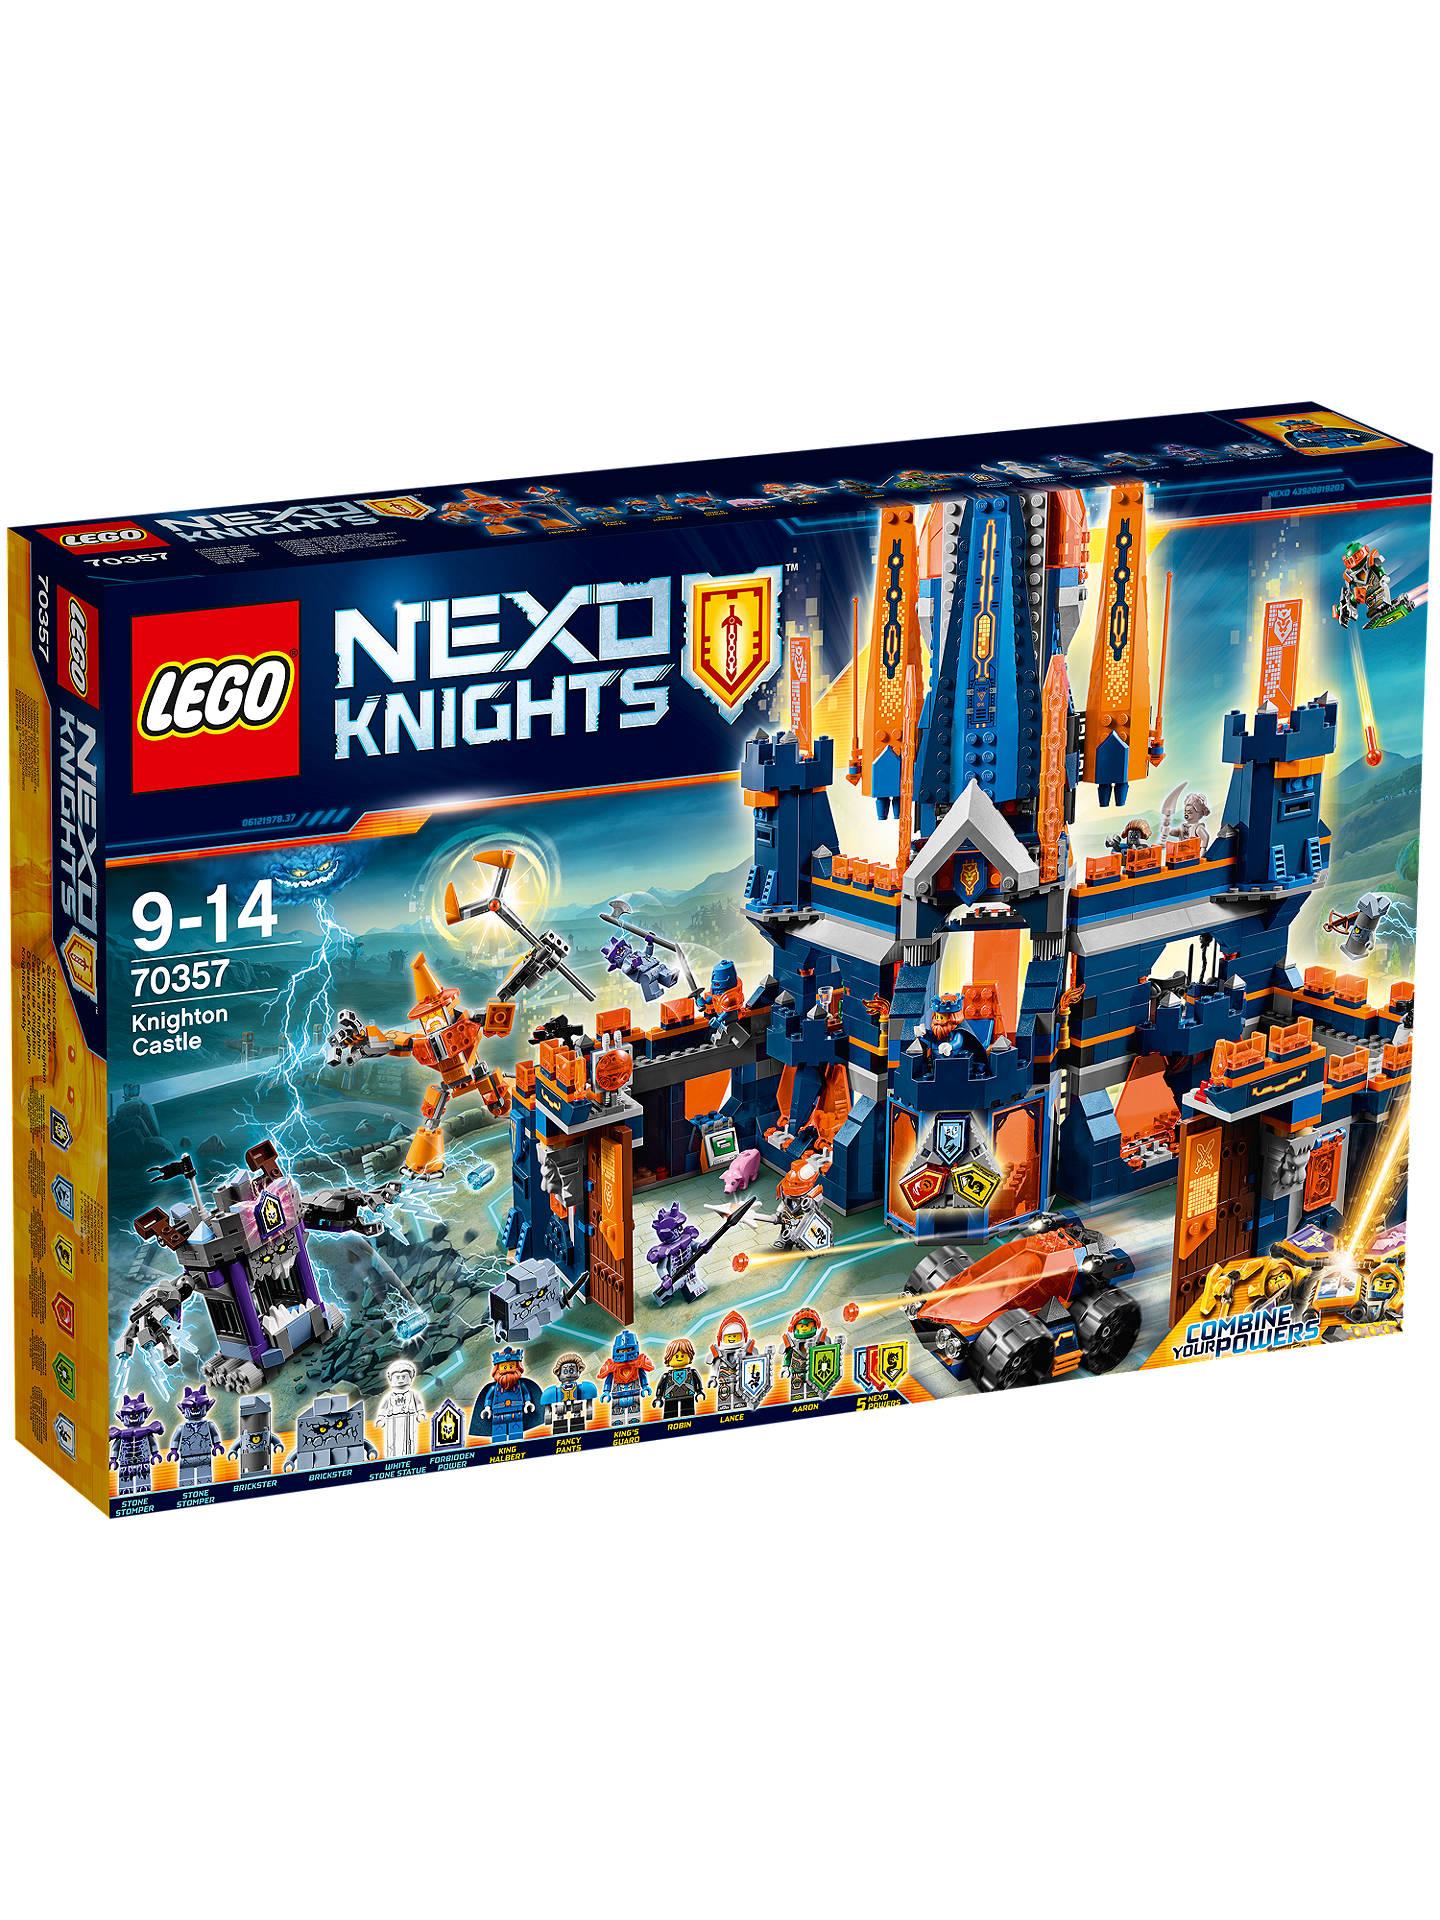 Lego Nexo Knights 70357 Knighton Castle £54.99 @ John Lewis & Partners